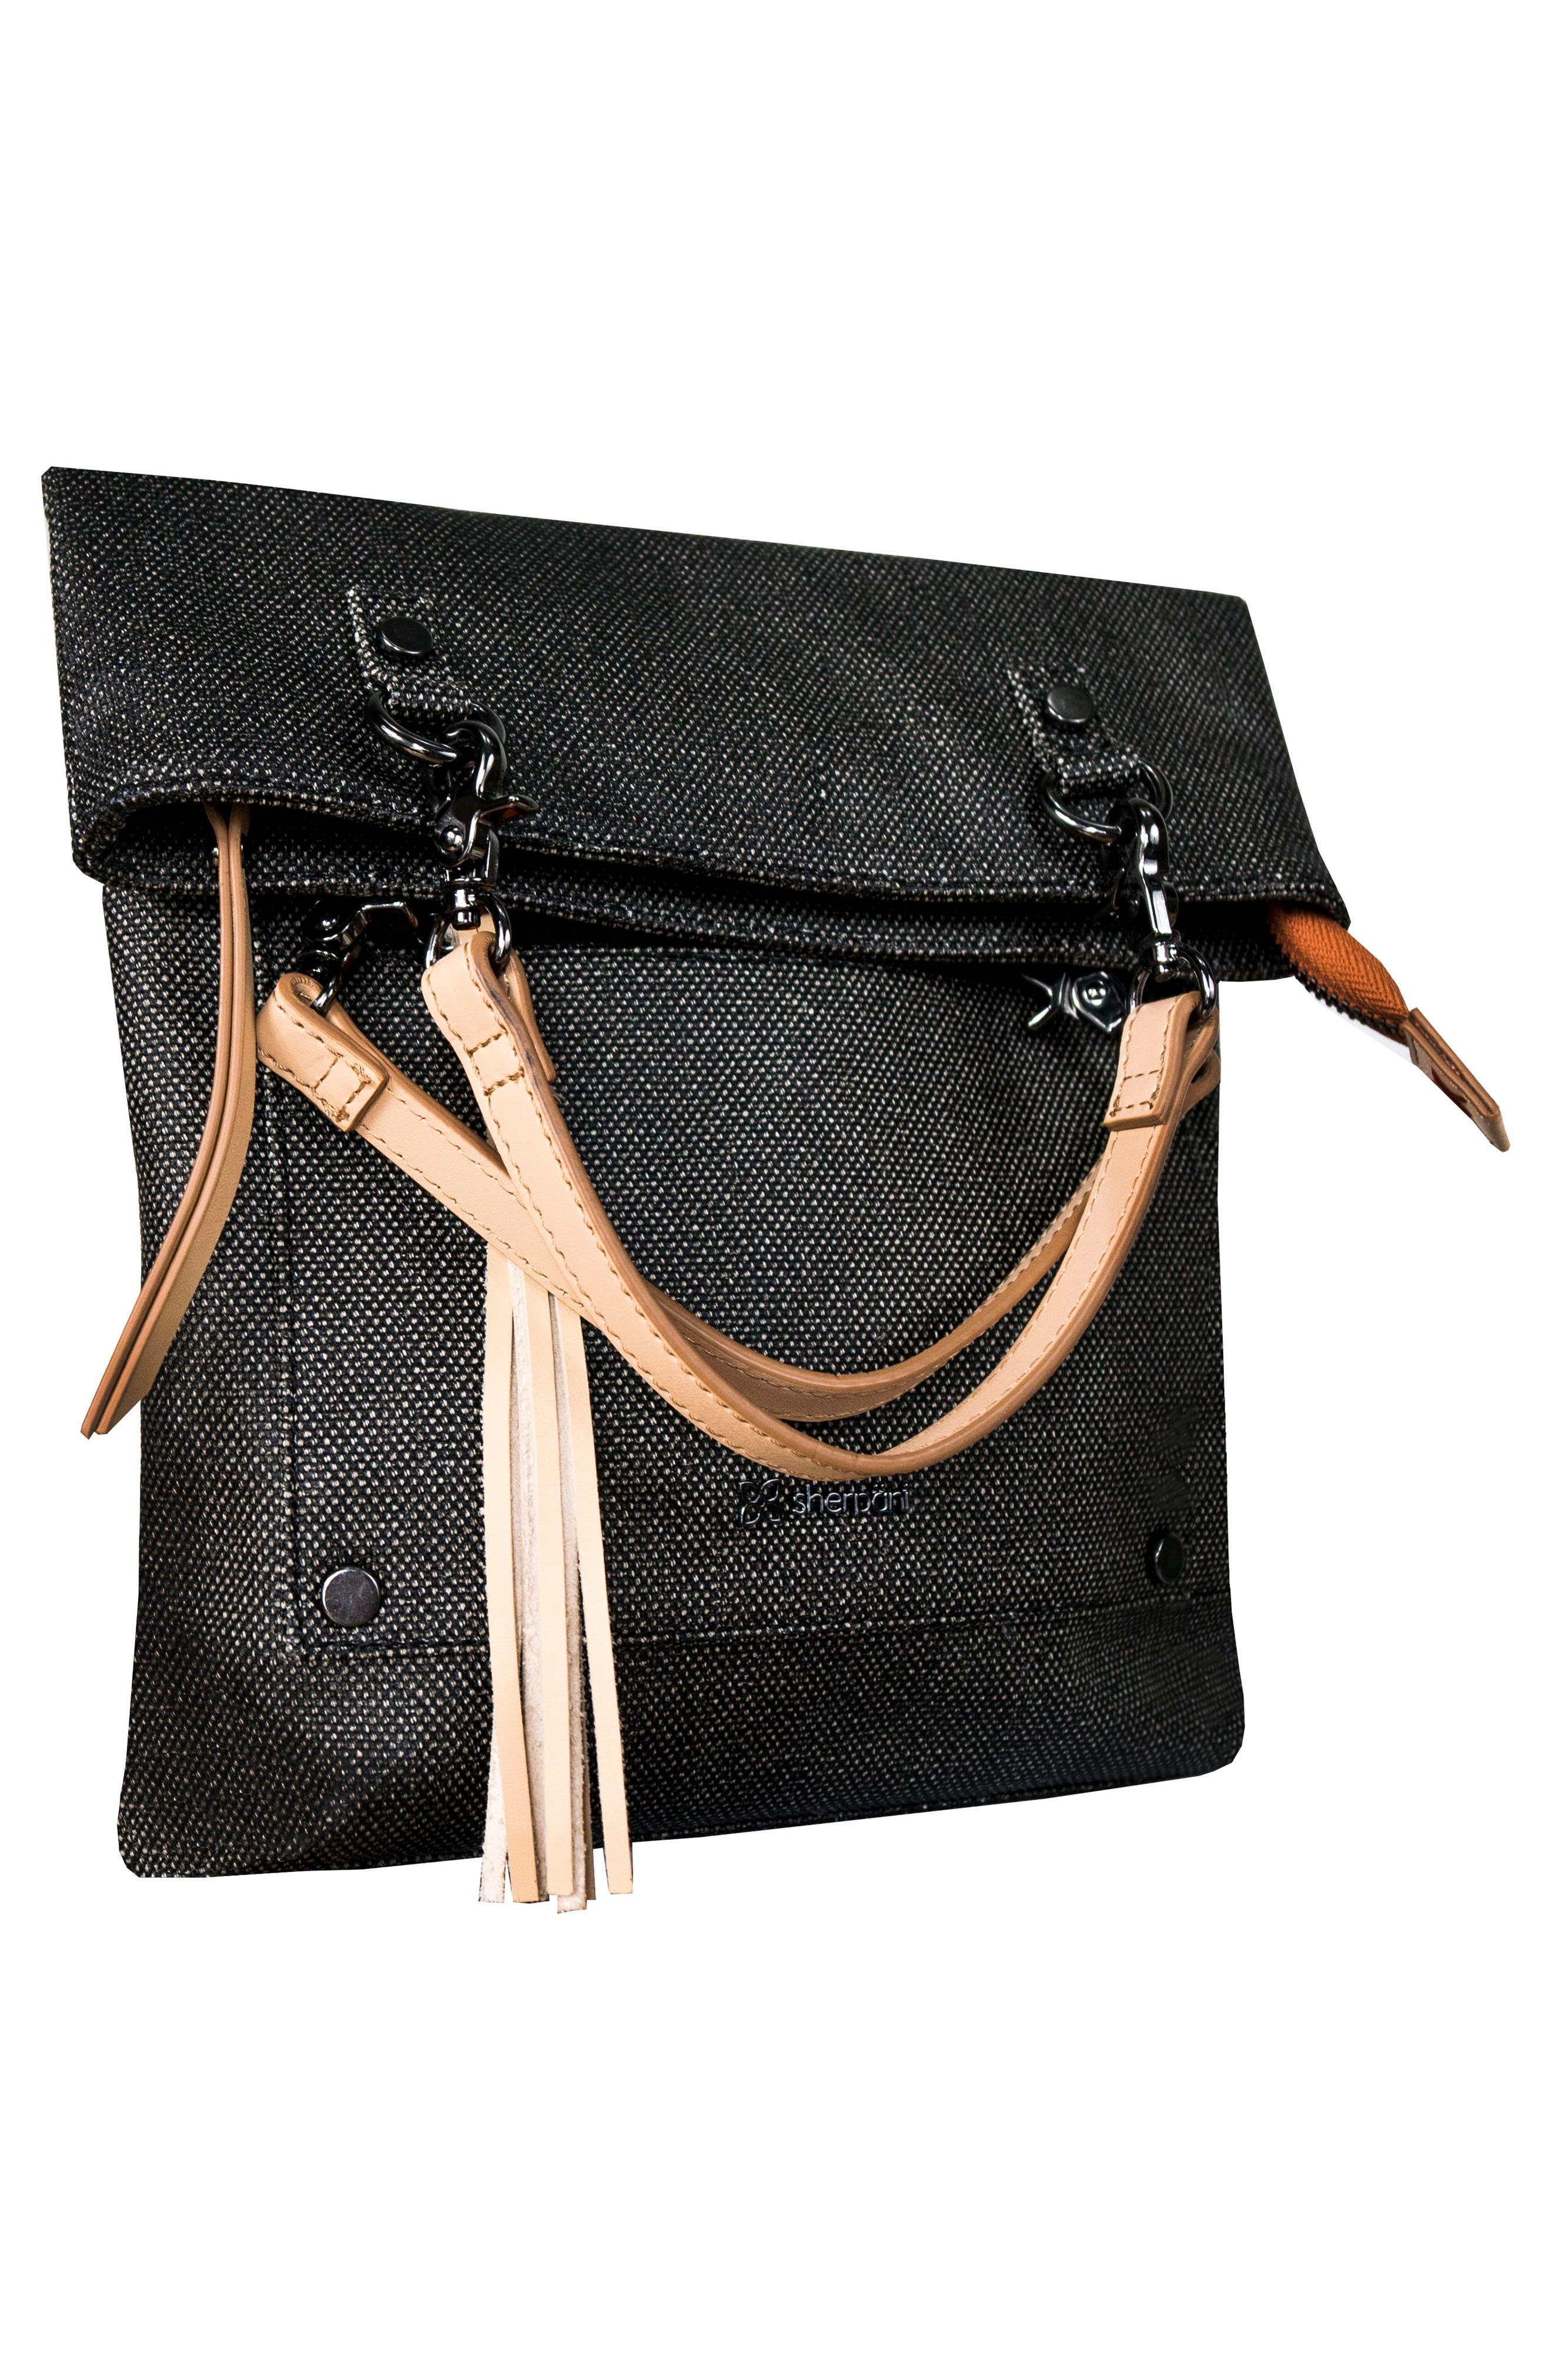 Rebel Coated Canvas Crossbody Bag,                             Alternate thumbnail 4, color,                             Blackstone